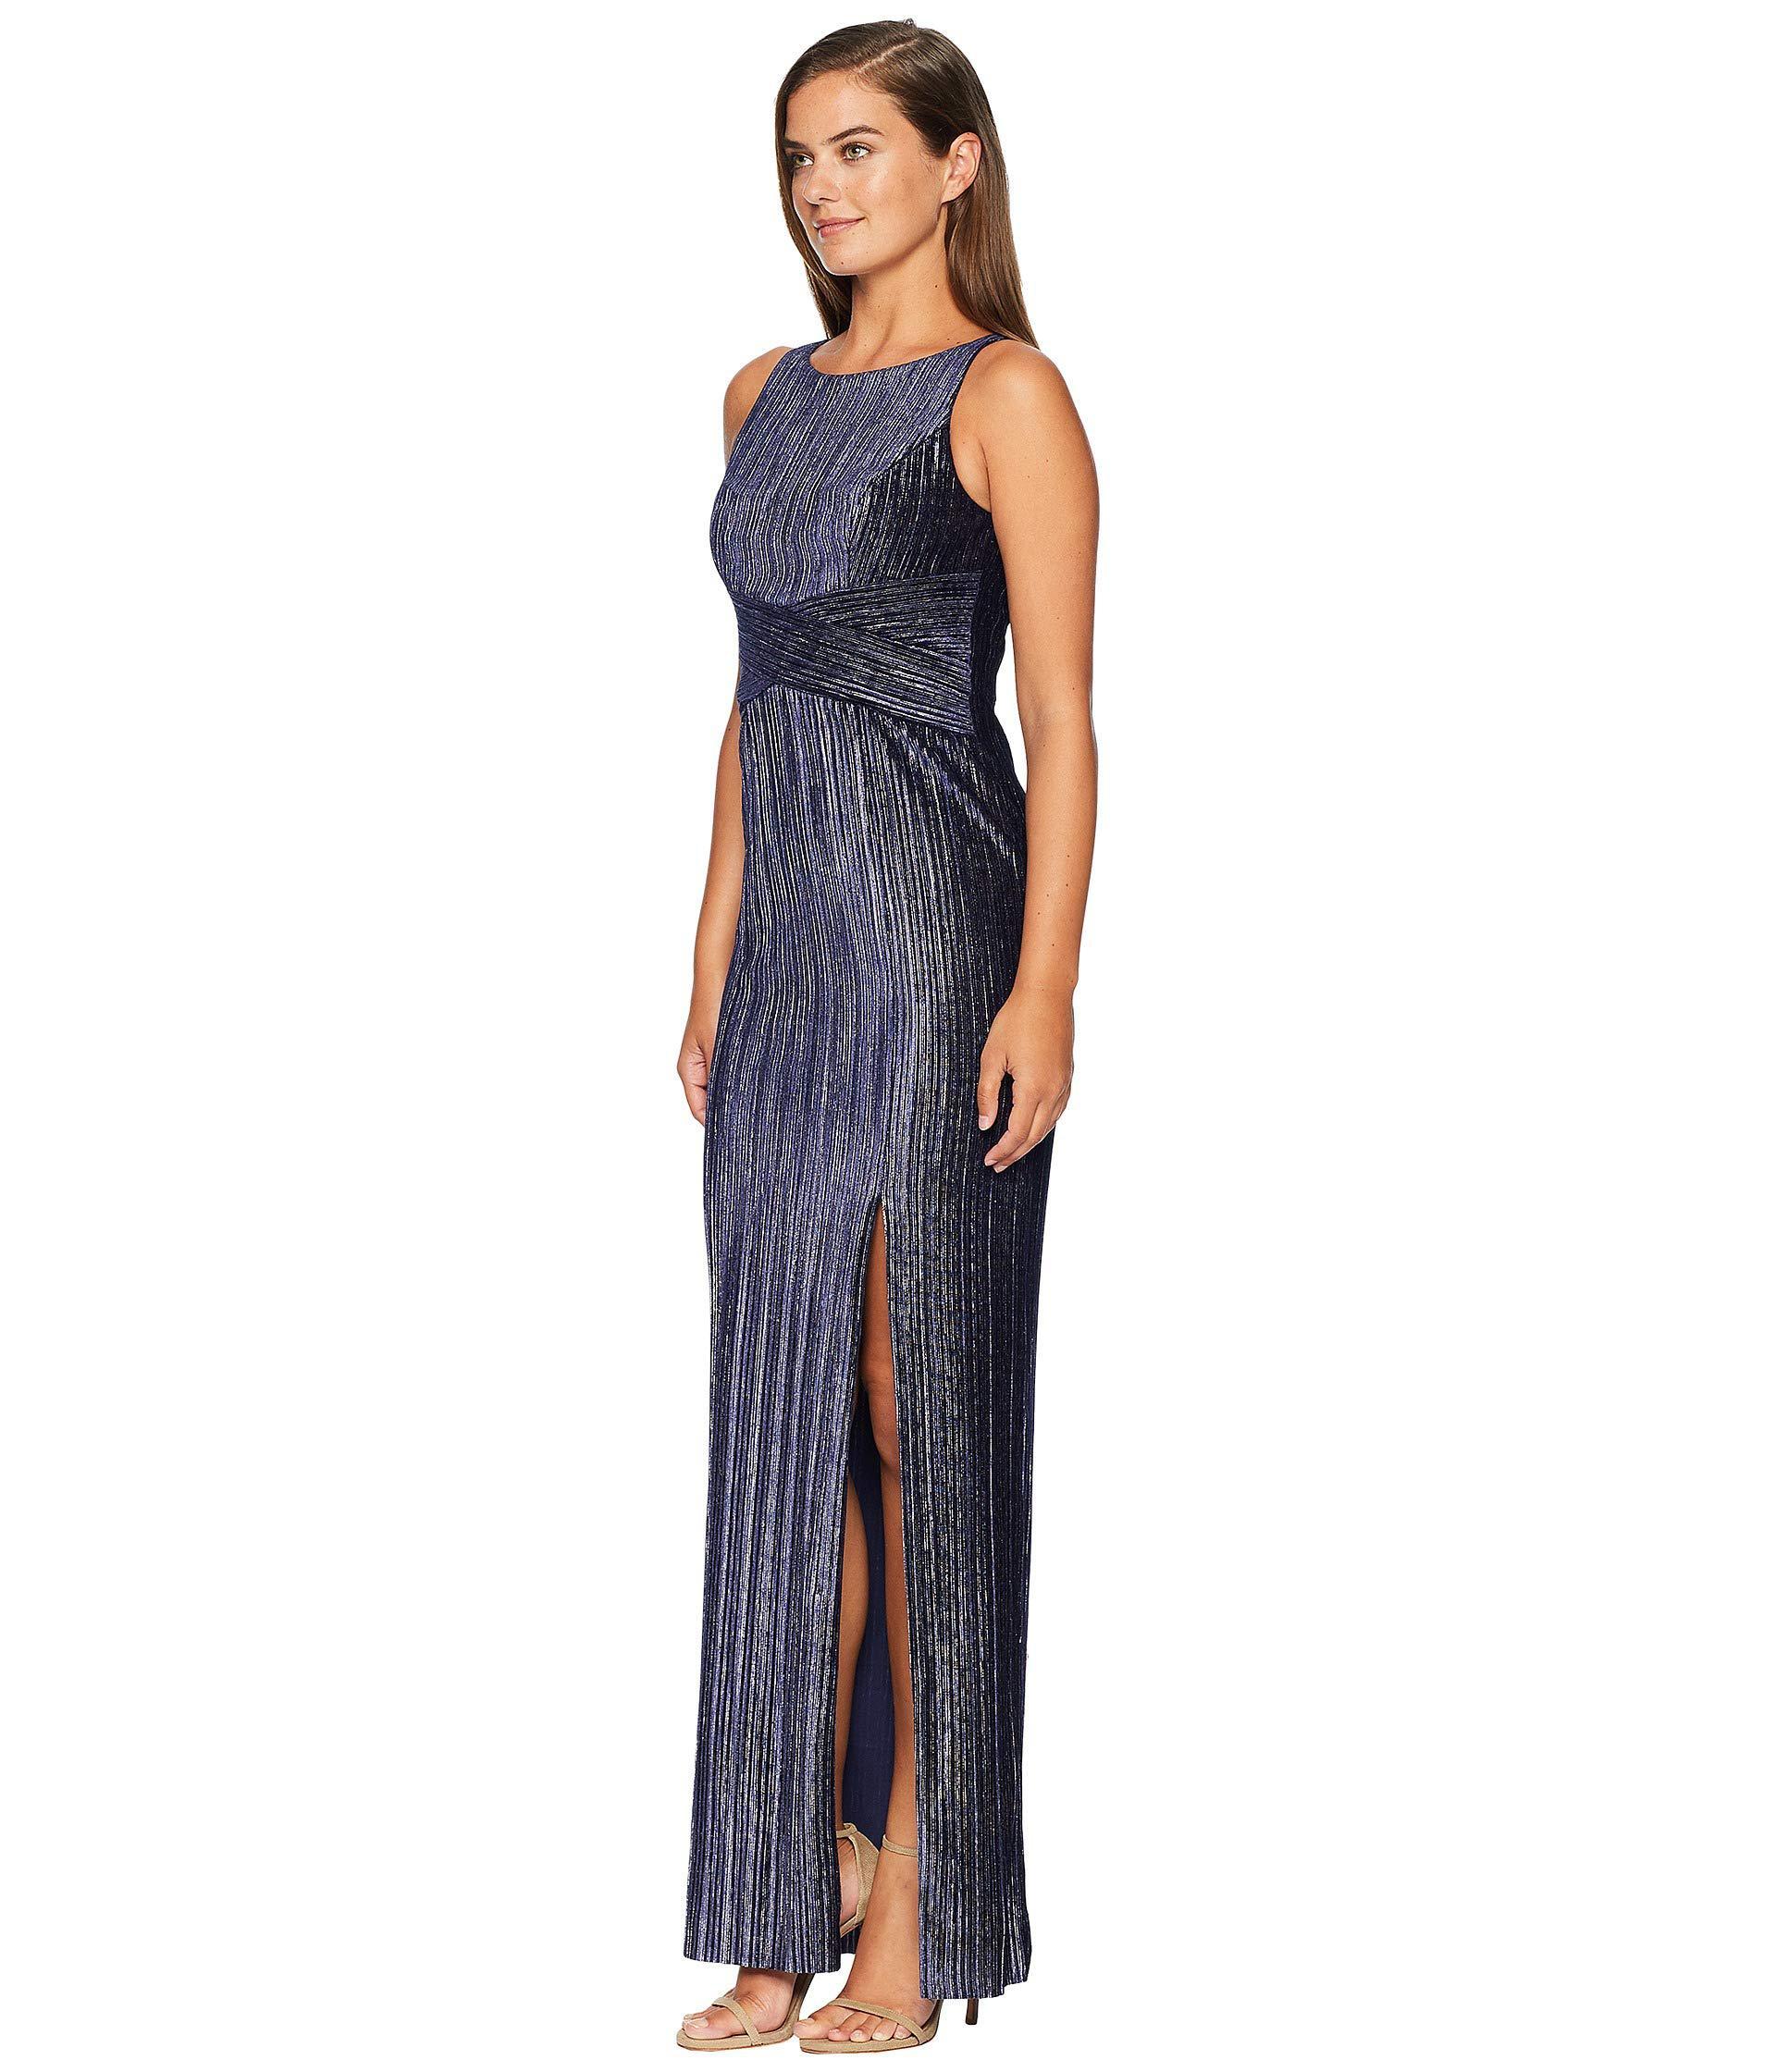 3a2457775201 Adrianna Papell Pleat Velvet Column Dress (navy) Women's Dress in Blue -  Lyst